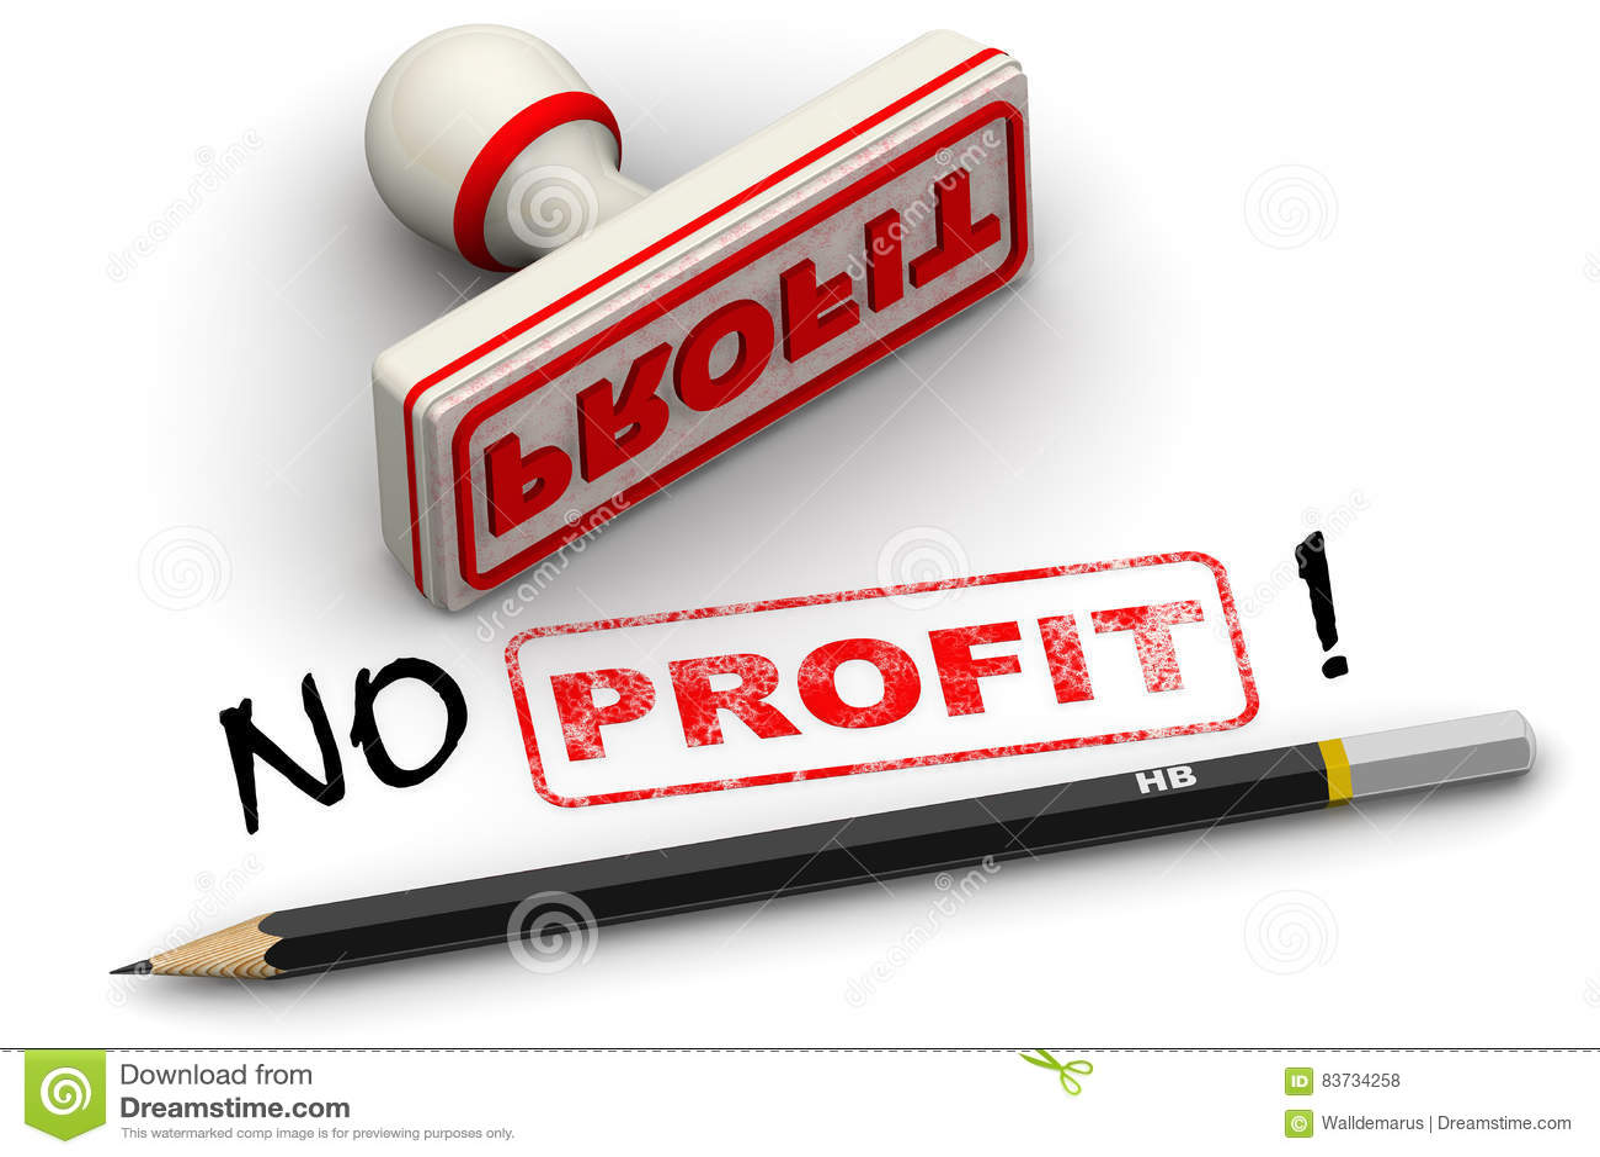 No profit! Corrected seal impression